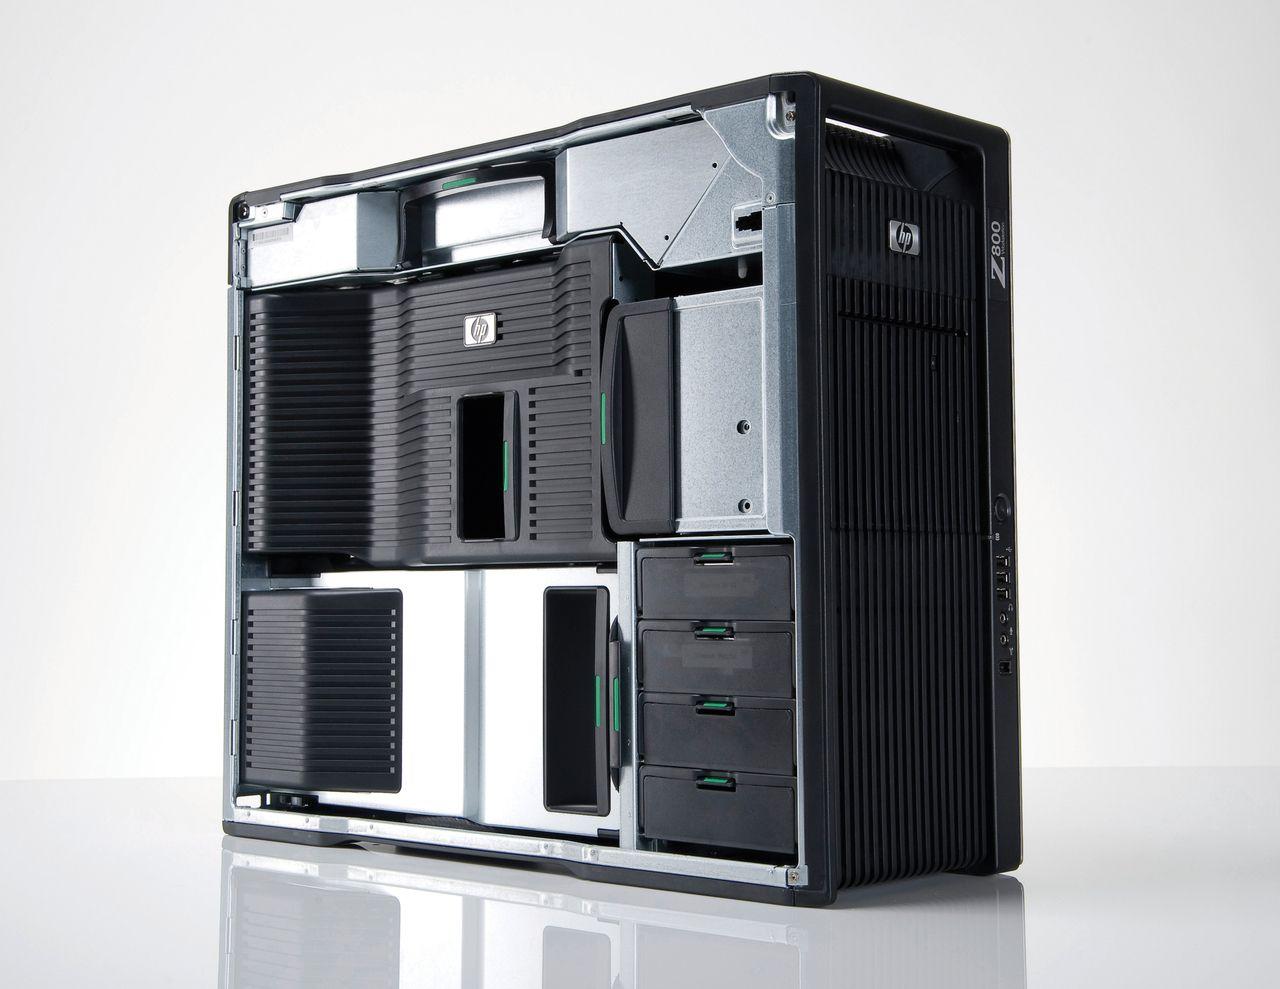 HP Z800 Workstation - Dual CPU v3 (CTO) | Workstations